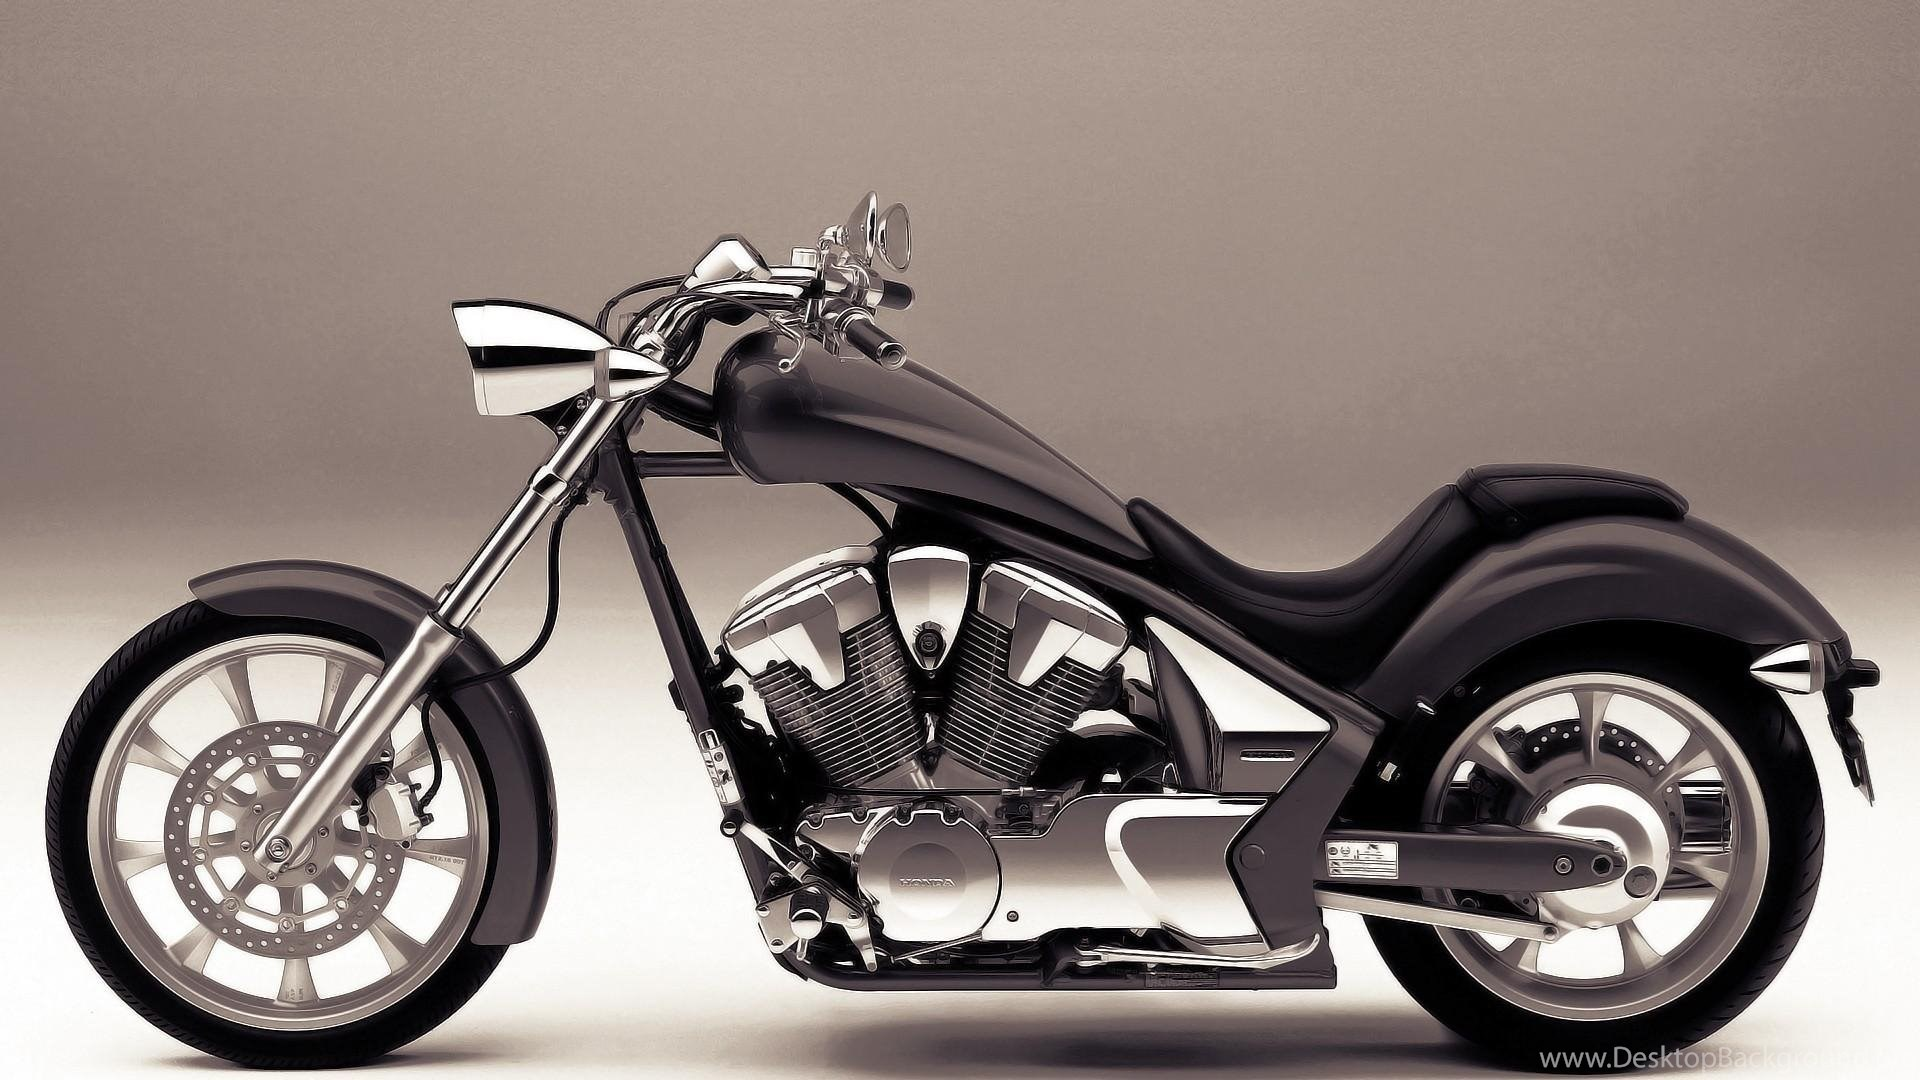 white honda engines chrome motorbikes vtx1300 bikers wallpapers